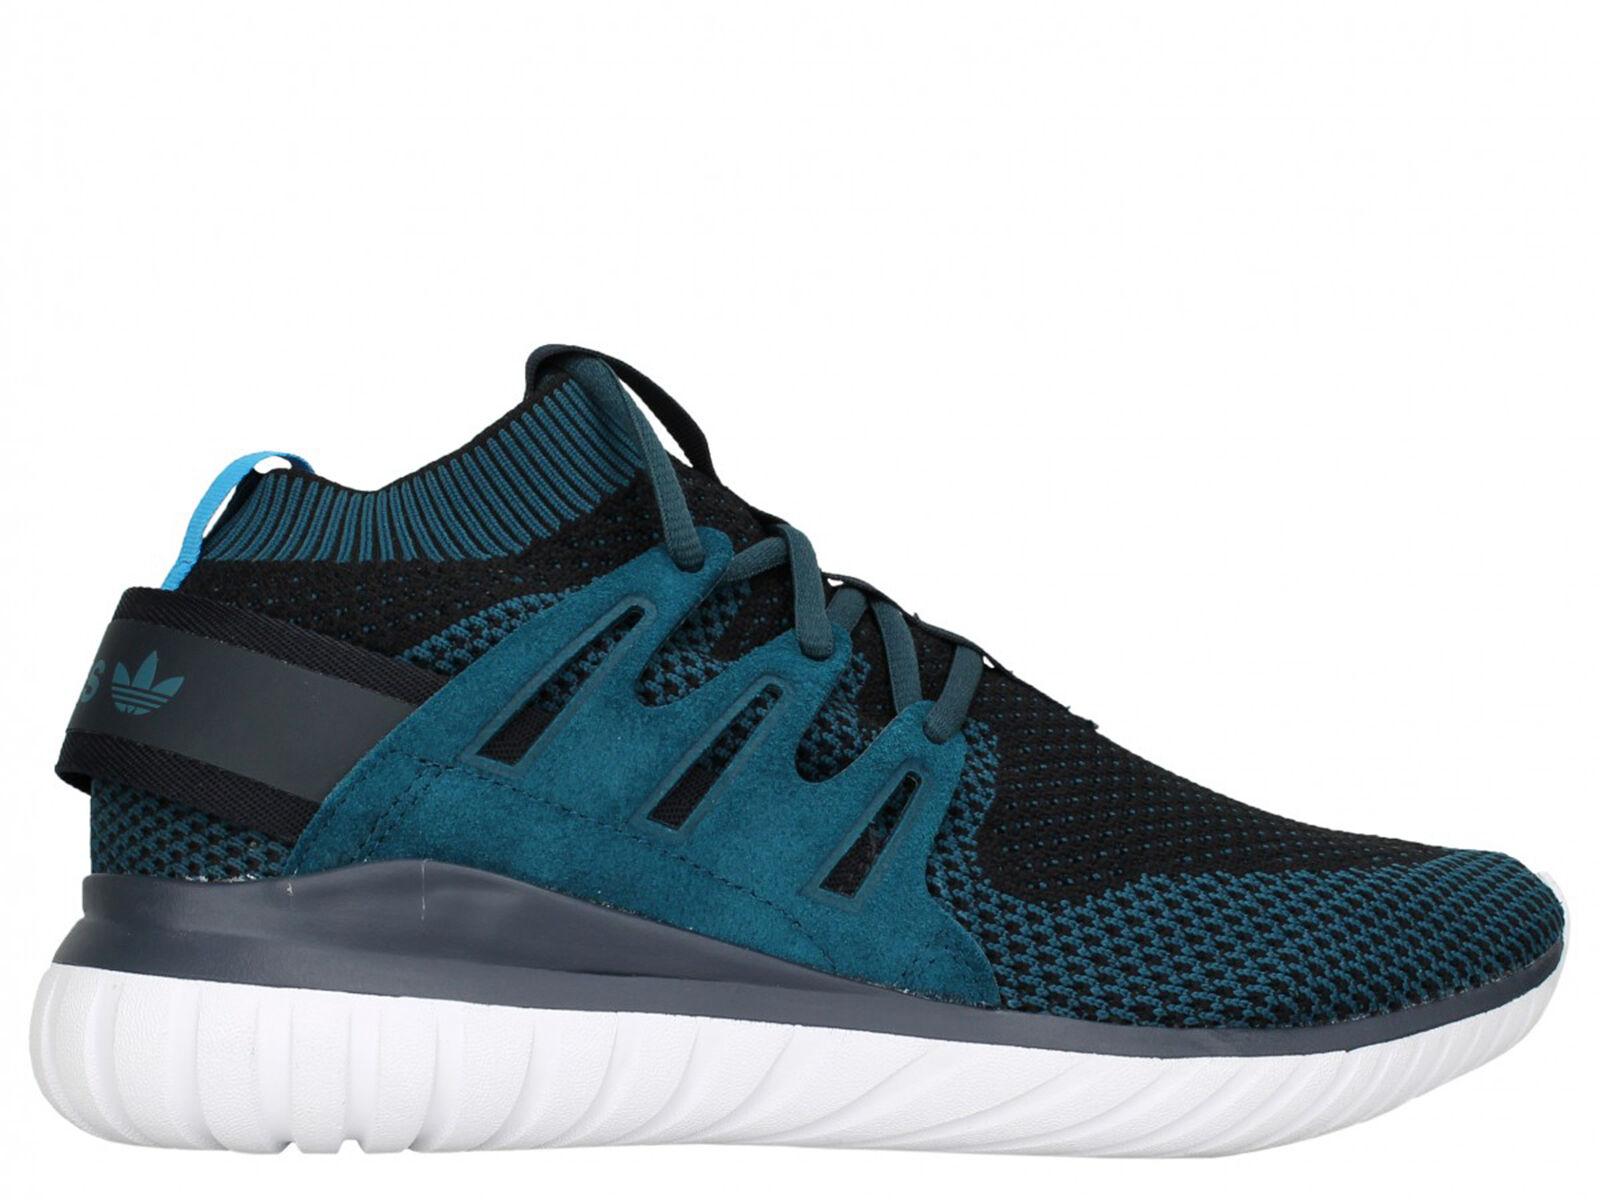 Men's Brand New Adidas Tubular Nova PK Athletic Fashion Sneakers [S74916]